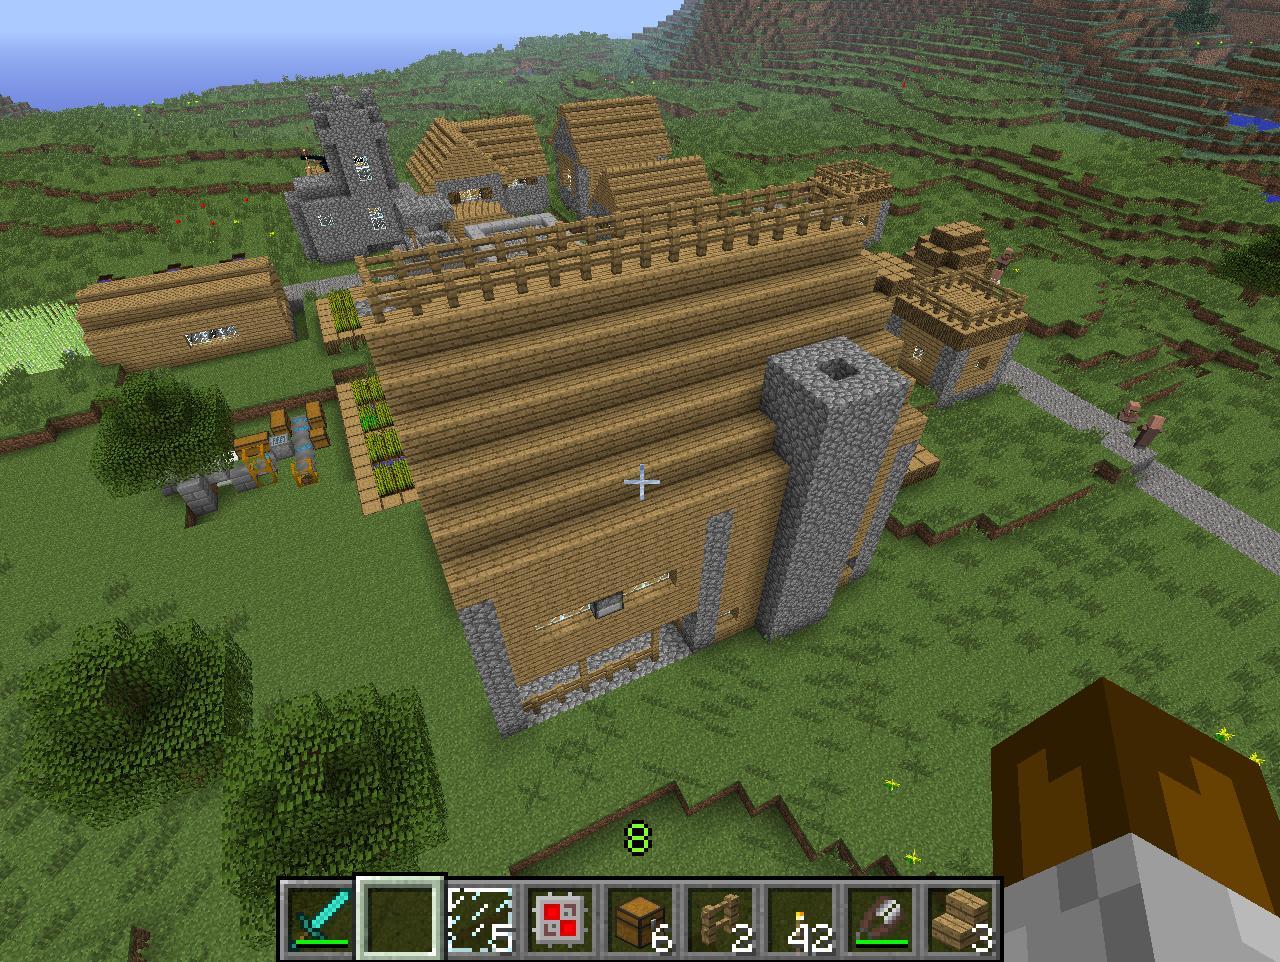 Minecraft screenshots small inn pt1 by falcon01 on deviantart minecraft screenshots small inn pt1 by falcon01 ccuart Gallery